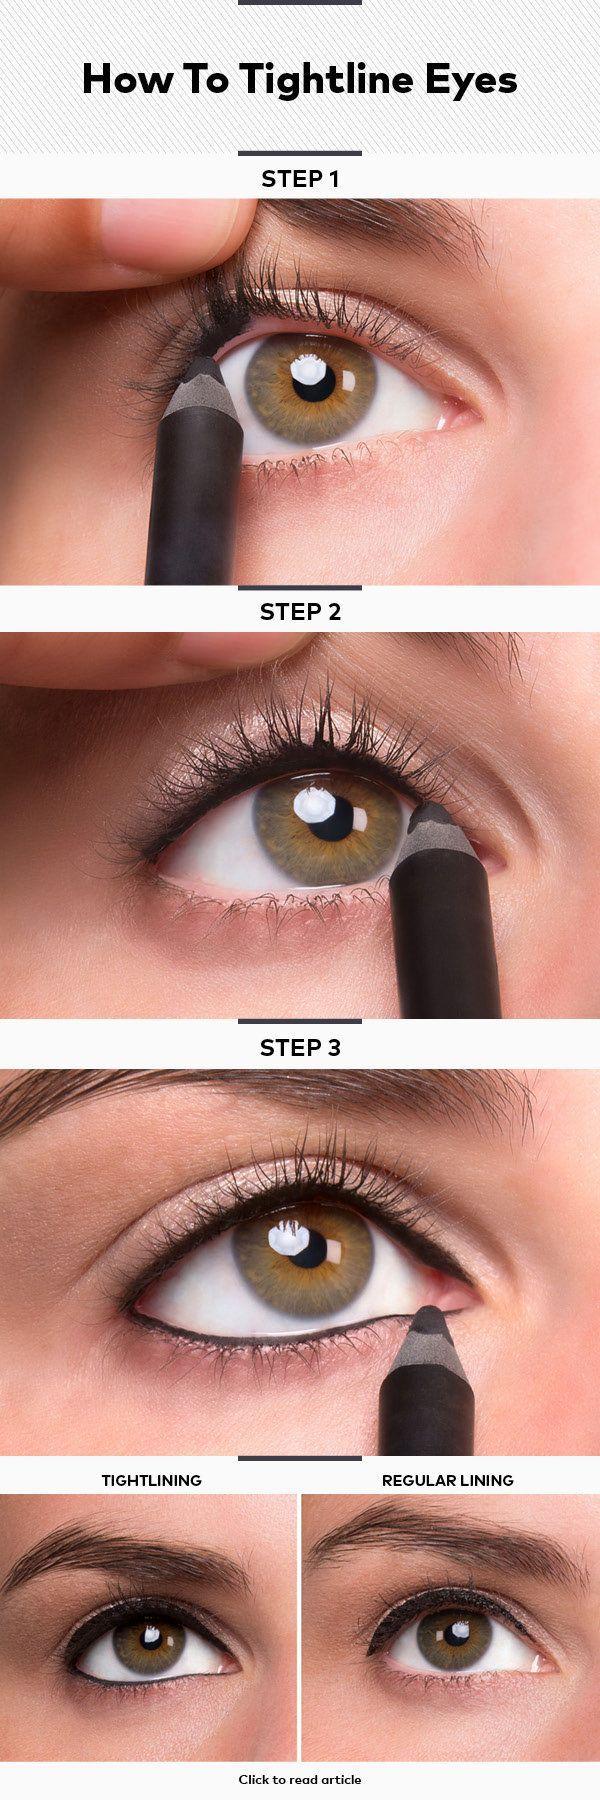 DIY Makeup Tips and Tutorials! Tightlining.